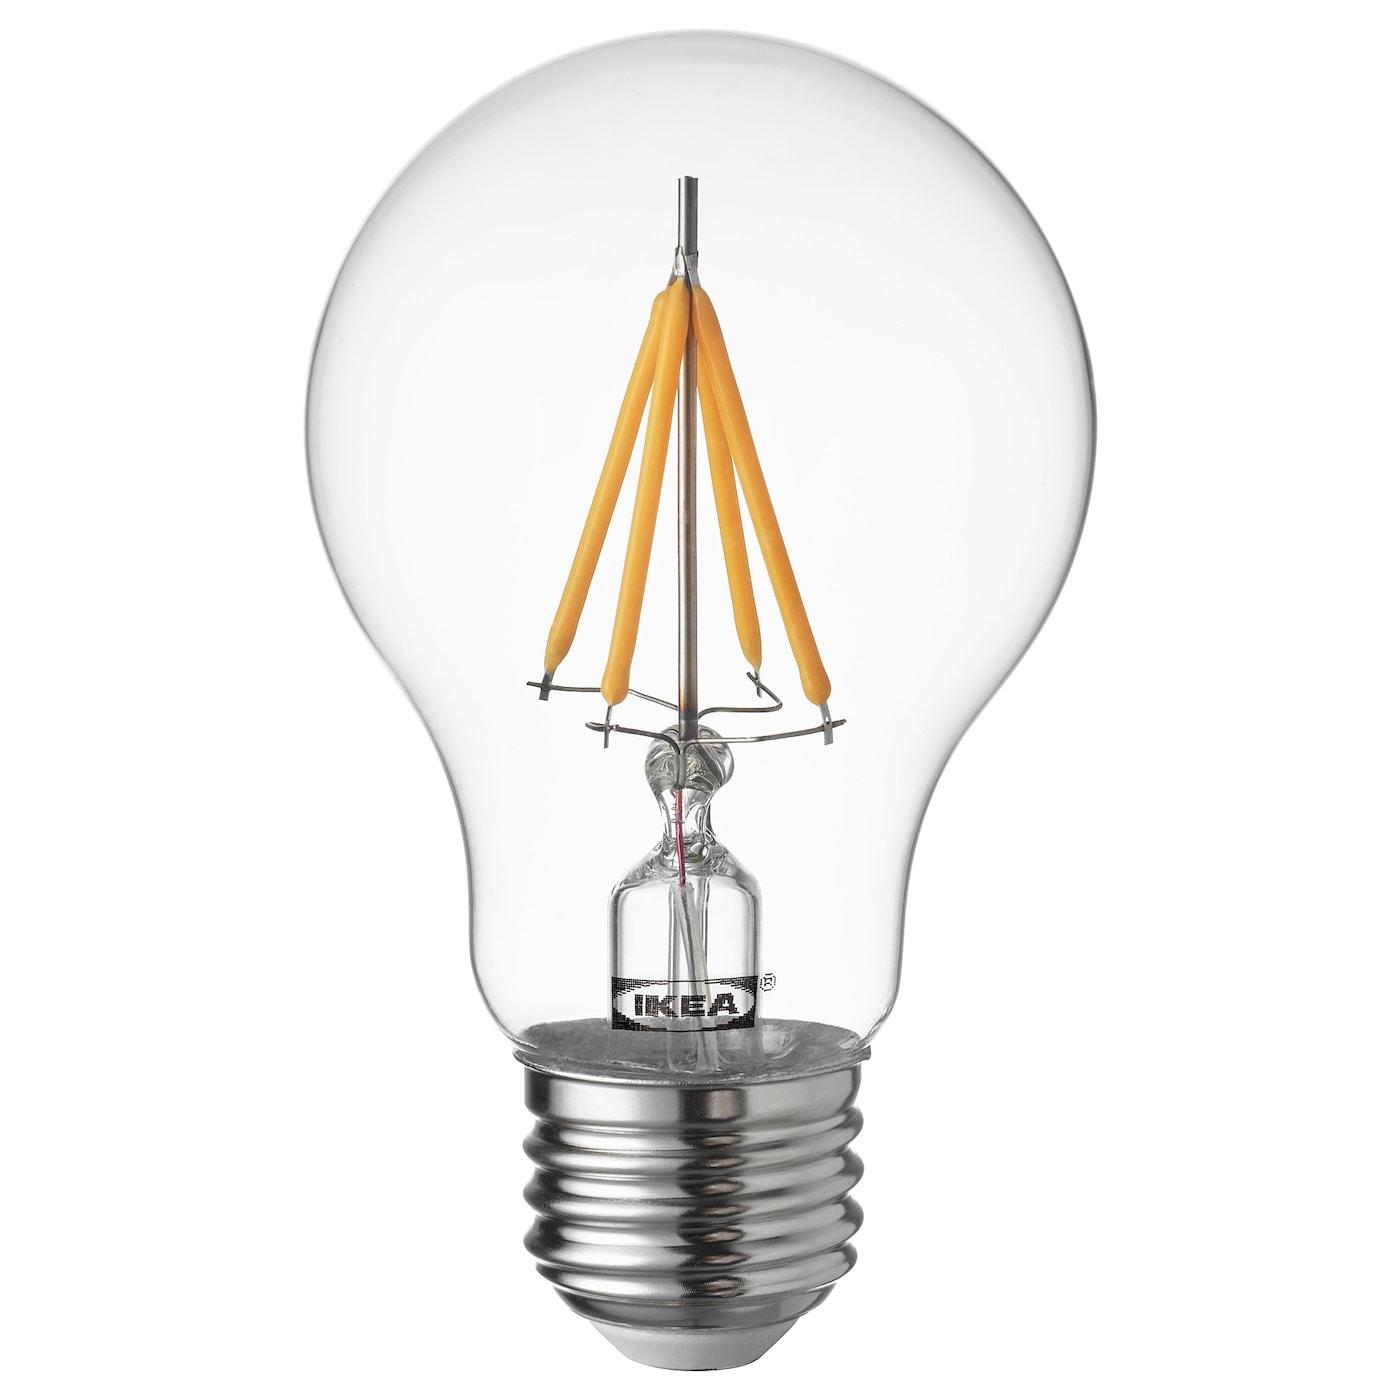 Pack of 6 IKEA RYET LED bulb GU10 200-230 lumen